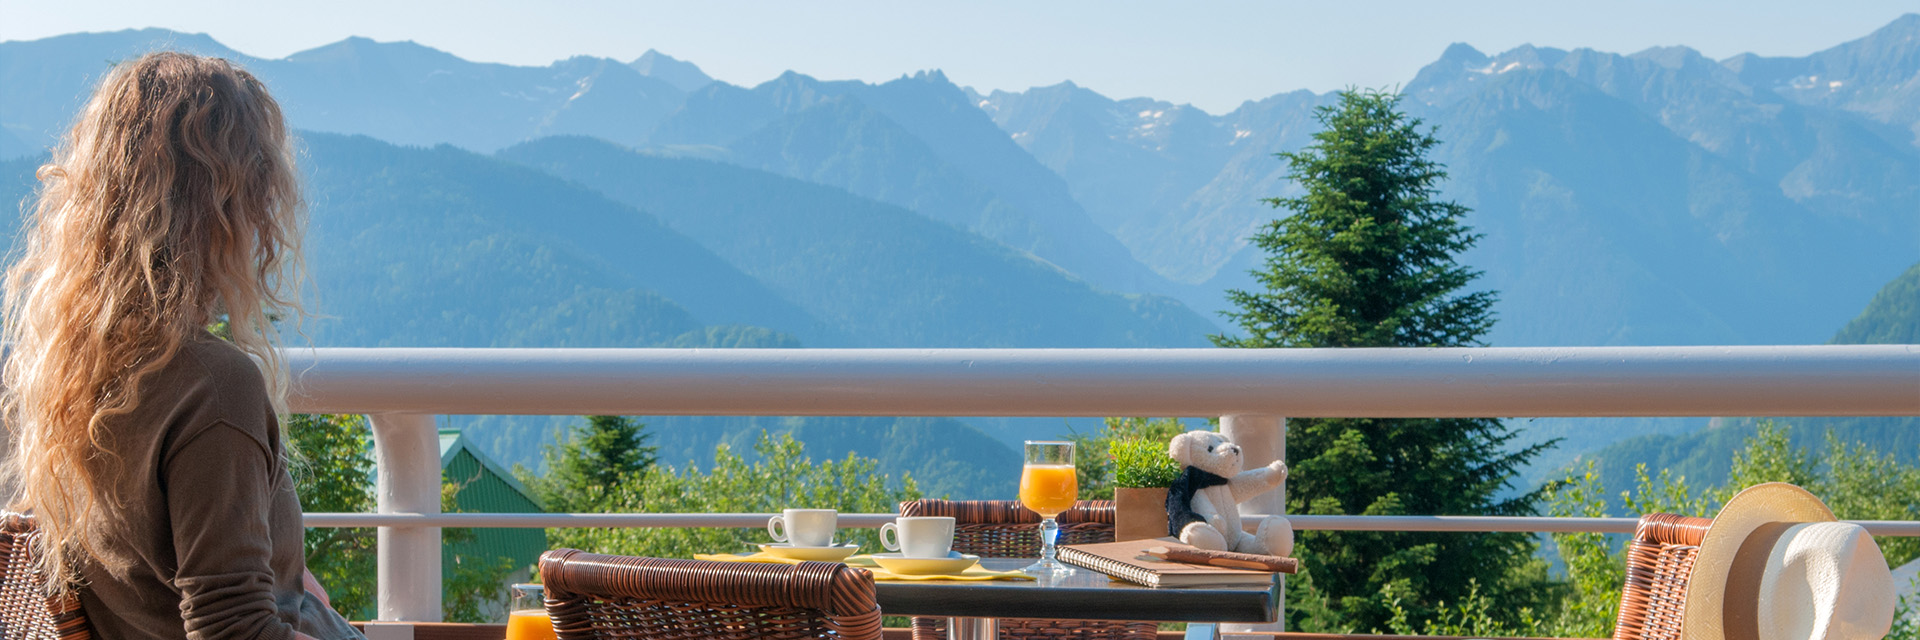 Village_club_vacances_pyrenees-tarbesou-vue-terrasse